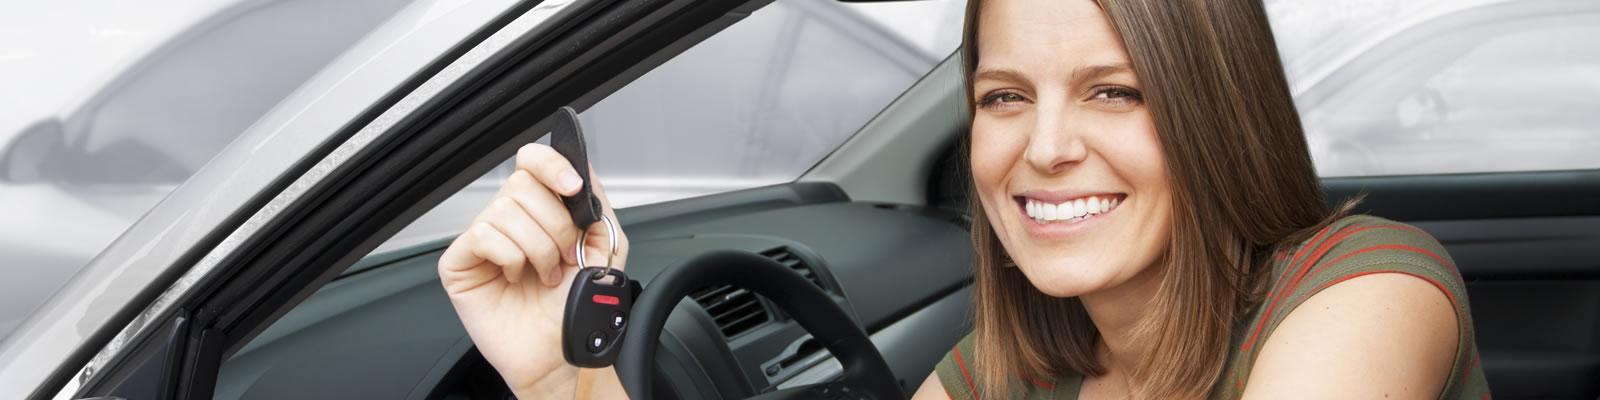 used-car-loans-customer